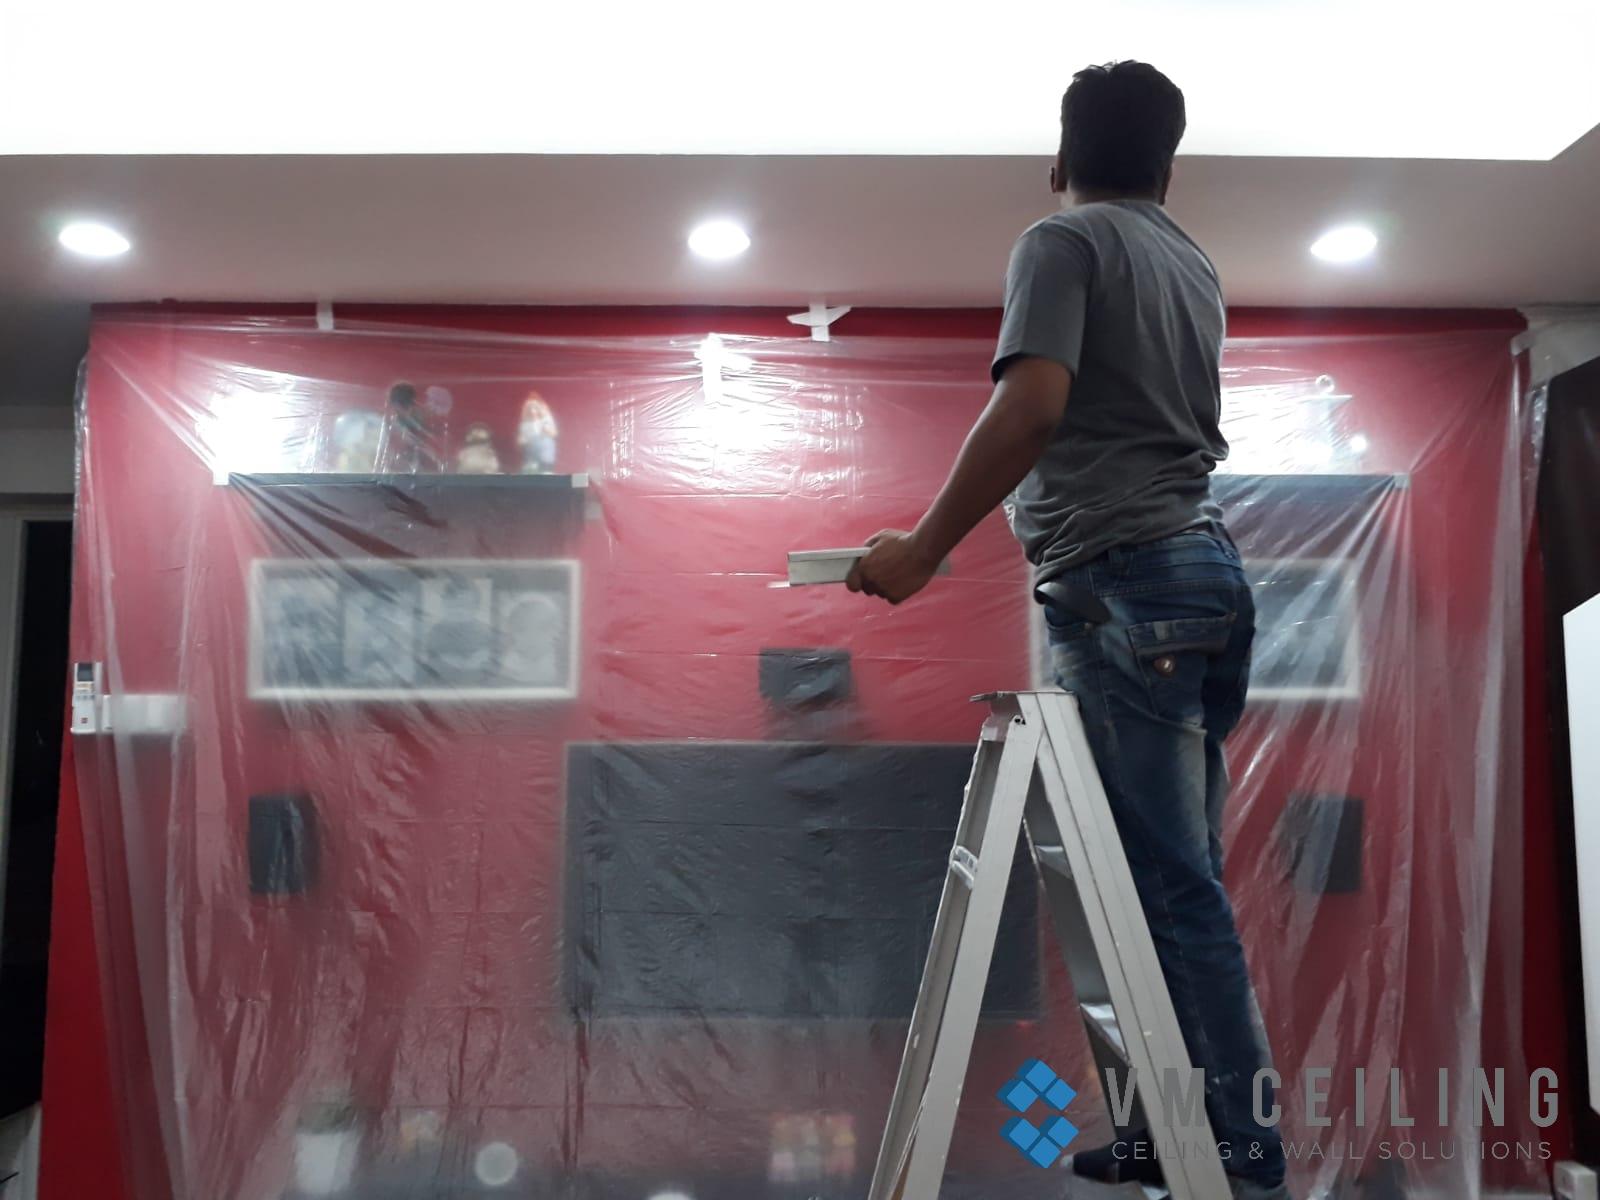 Living Room False Ceiling Downlights Installation vm ceiling Singapore HDB Admiralty 4